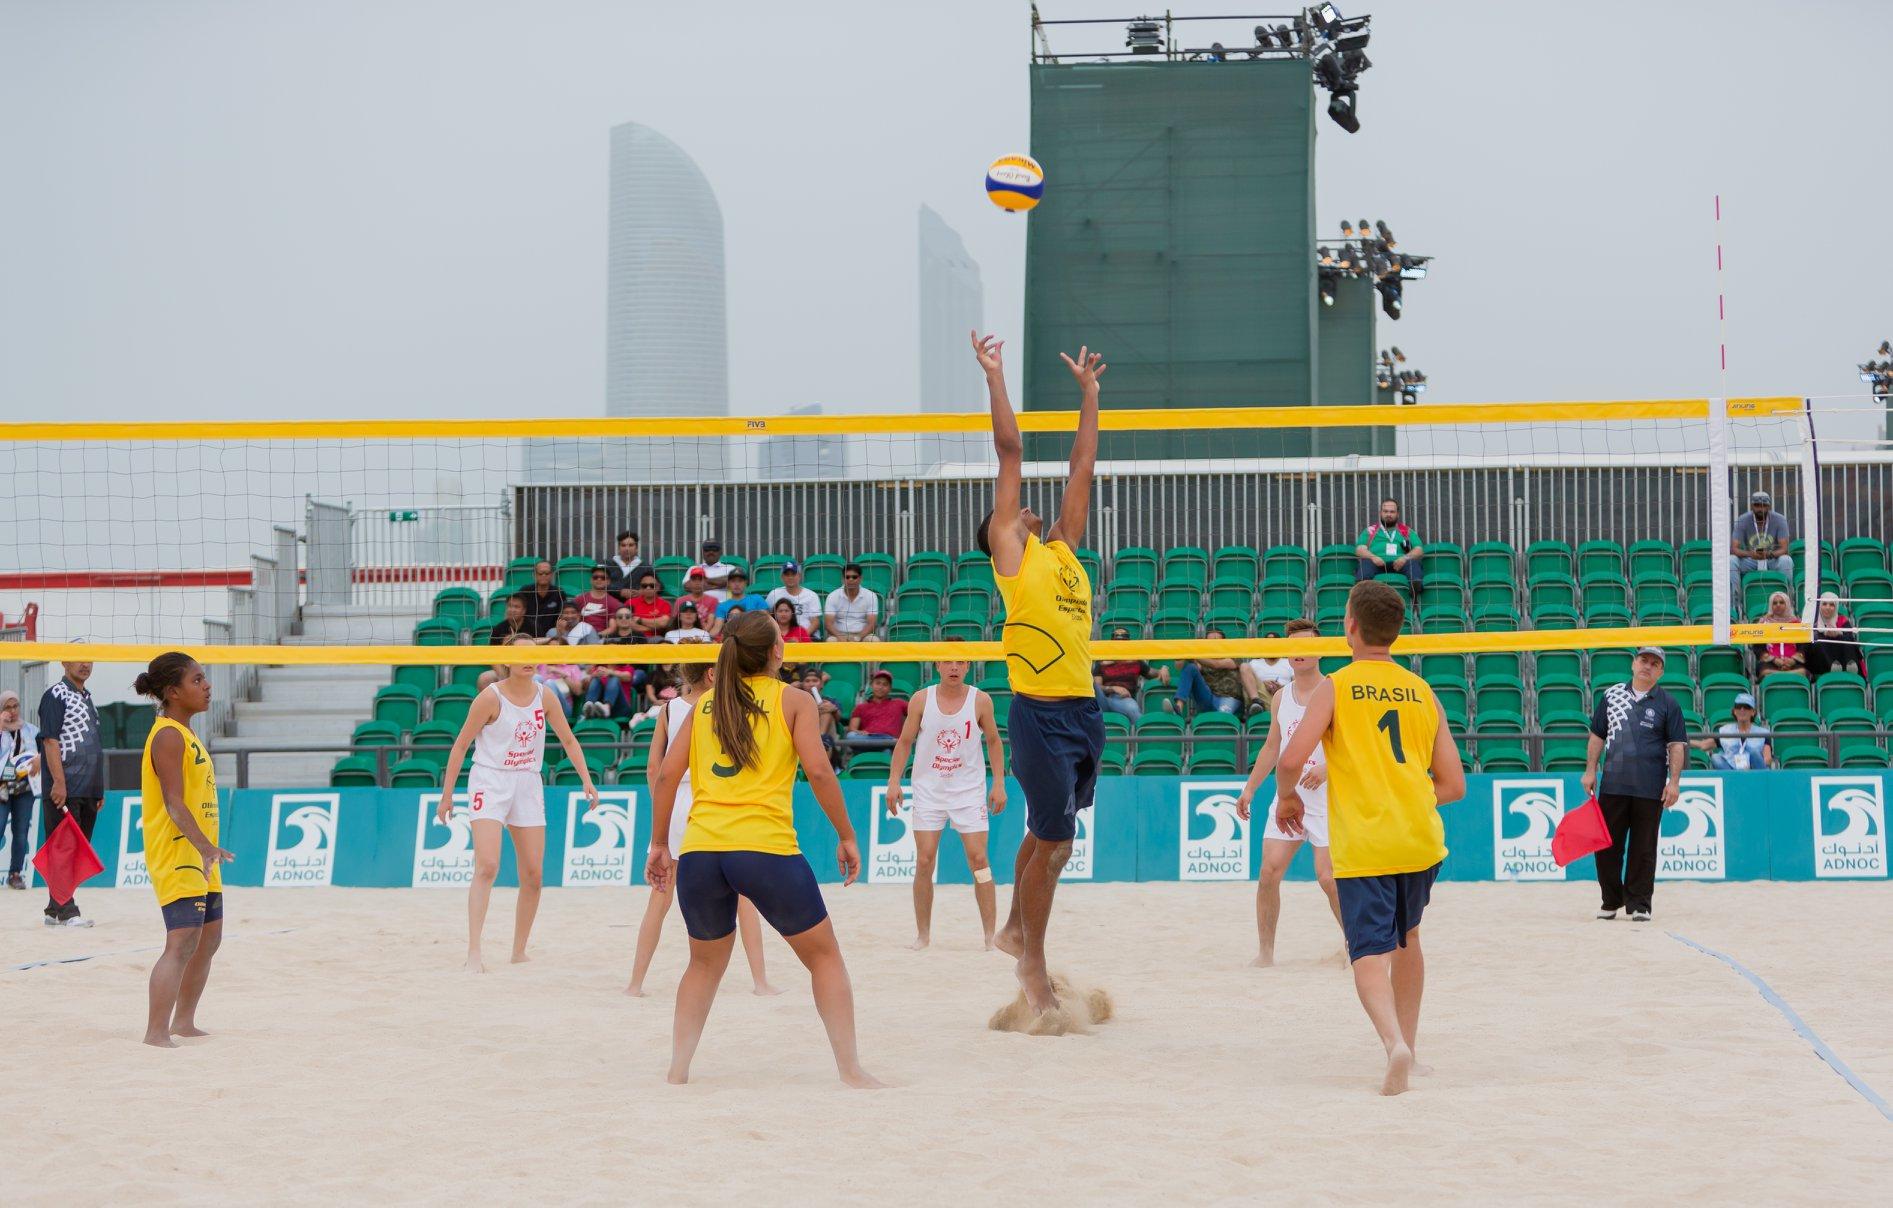 Day 3 - Corniche Beach